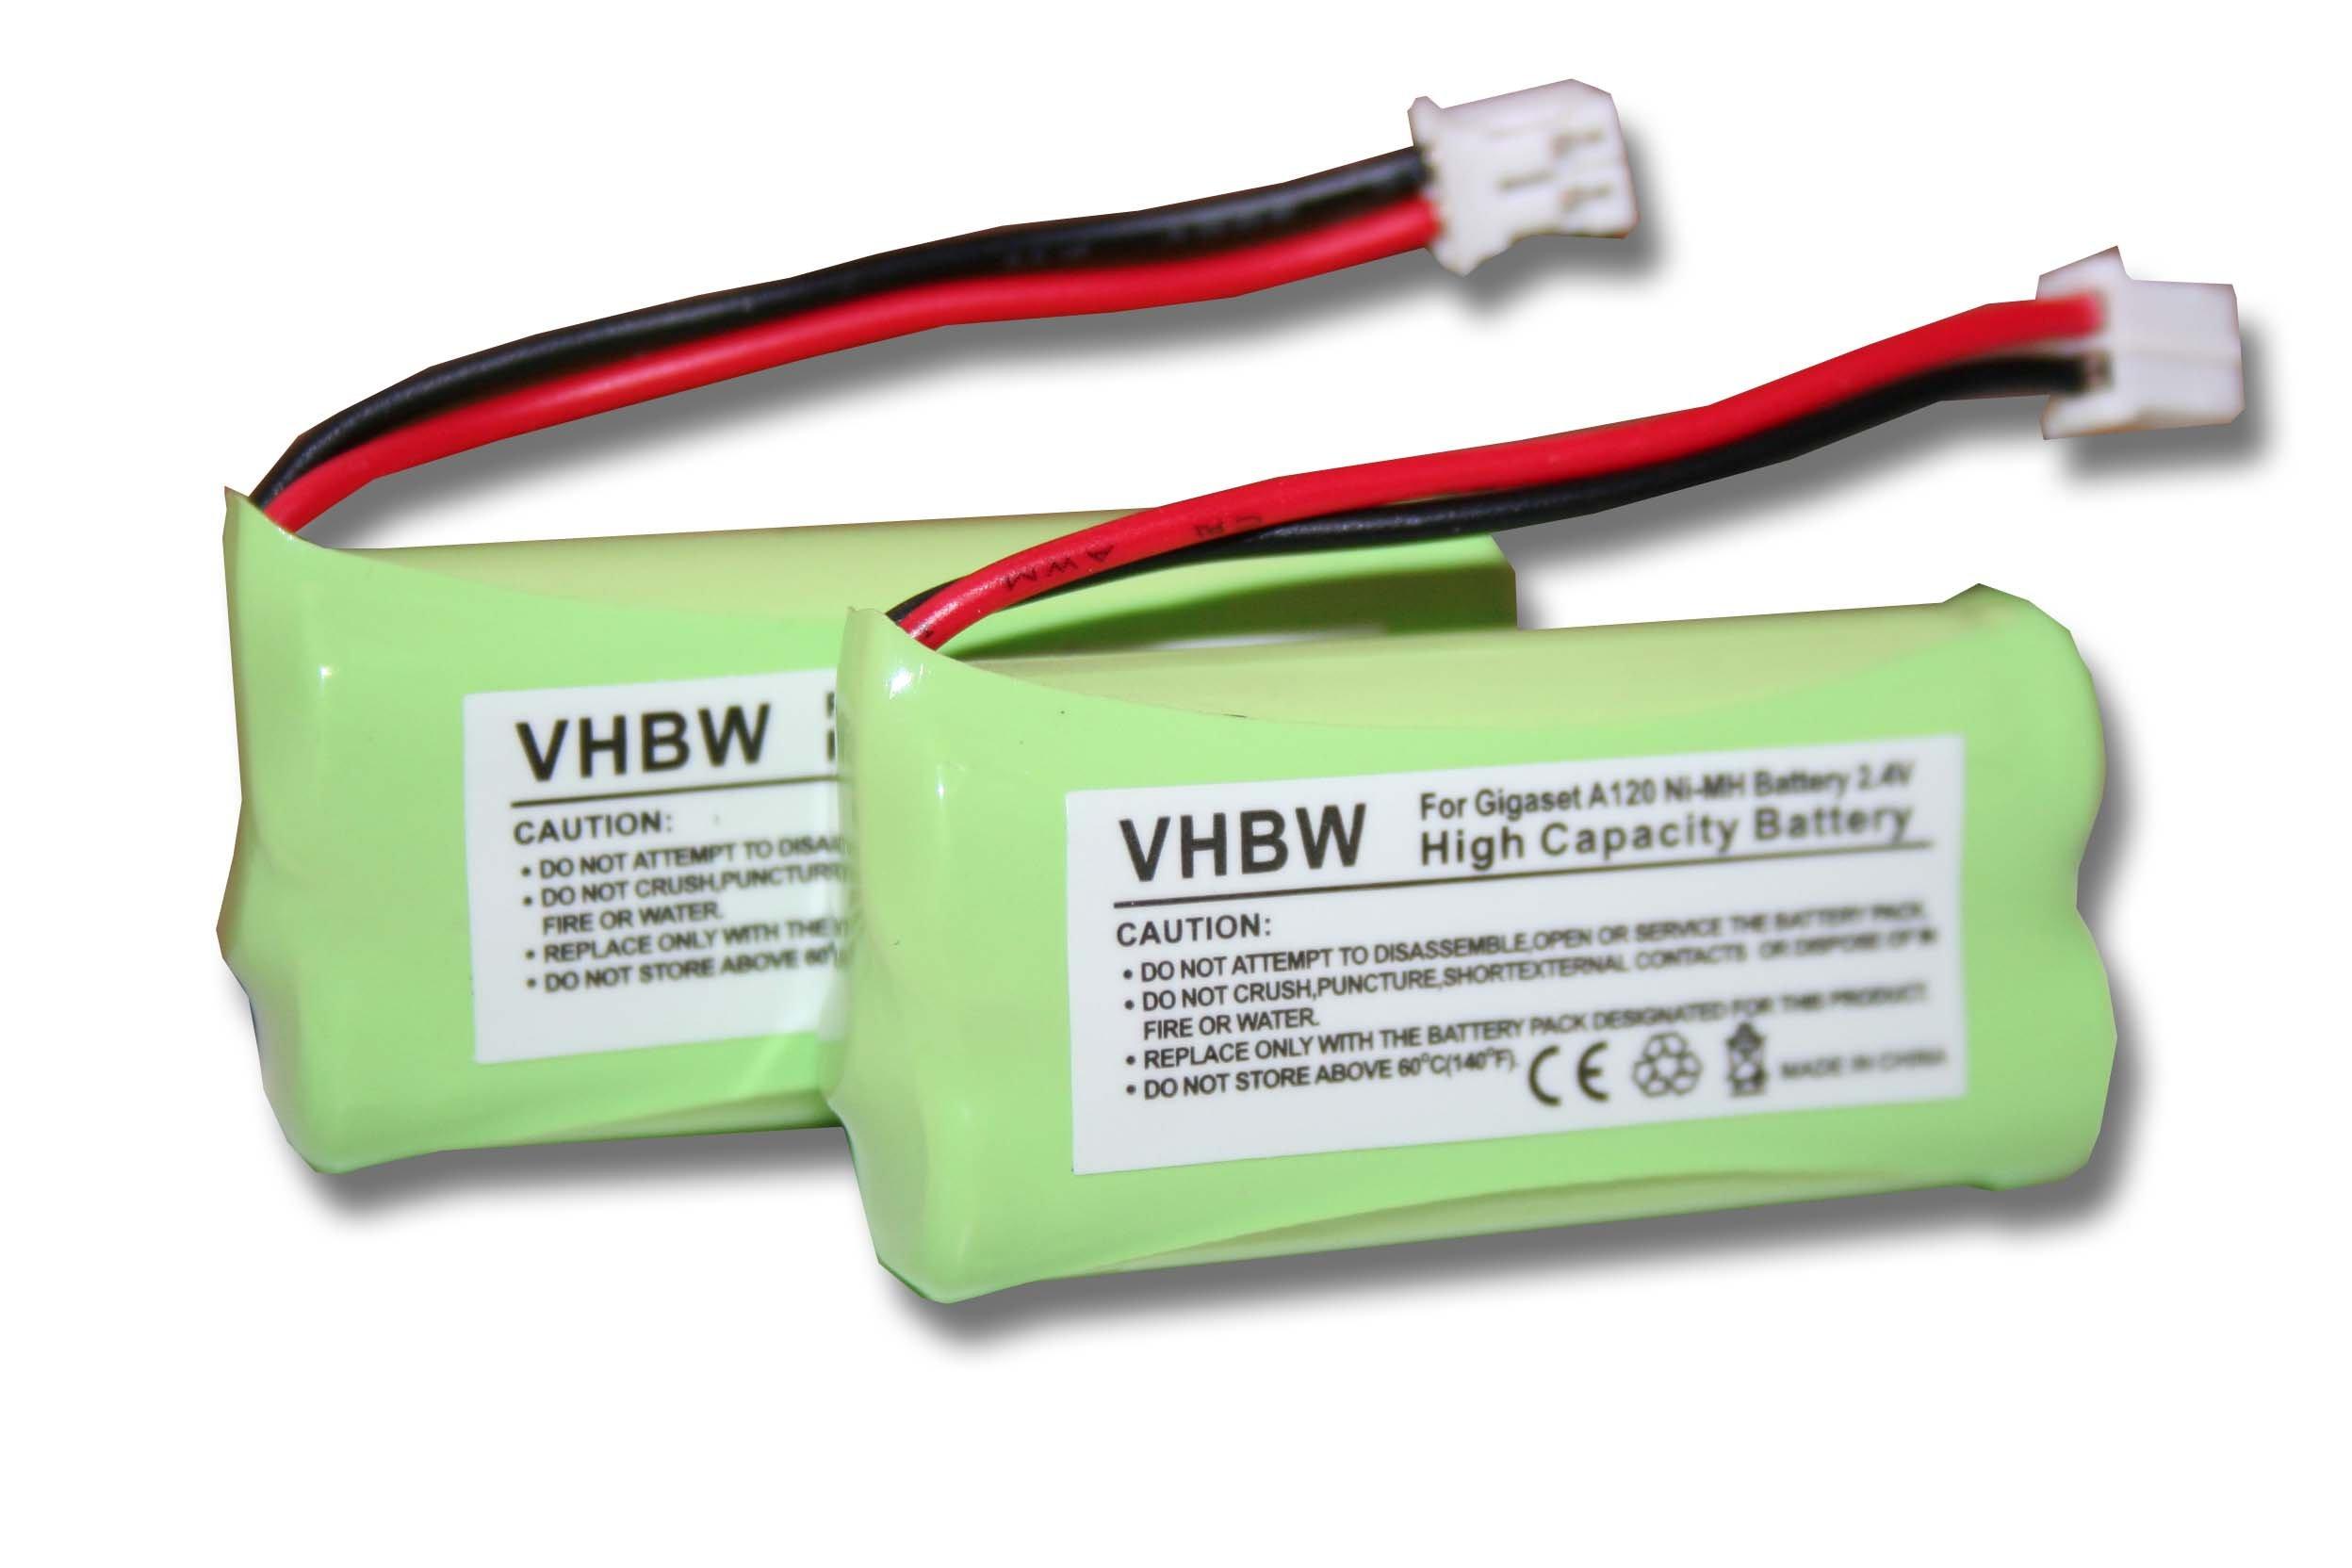 vhbw 2X NiMH batería 700mAh (2.4V) para teléfono Fijo inalámbrico Siemens Gigaset A12, A120, A14, A140 y V30145-K1310-X359, V30145-K1310-X383.: Amazon.es: Electrónica